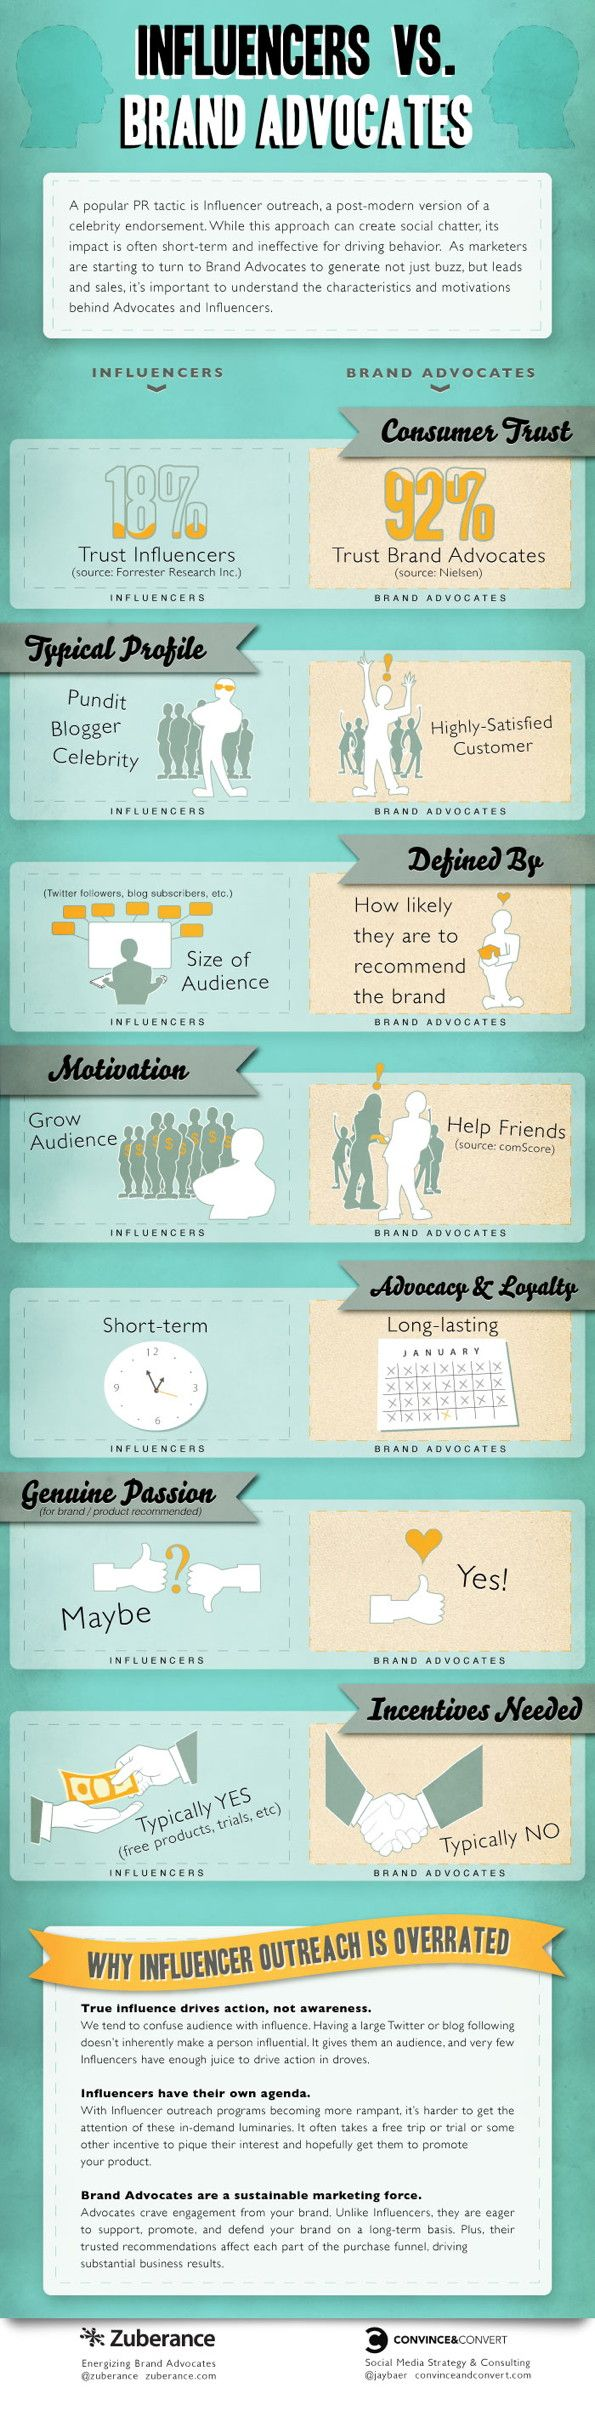 #Influencers vs Brand #Advocates [ #infographic ]